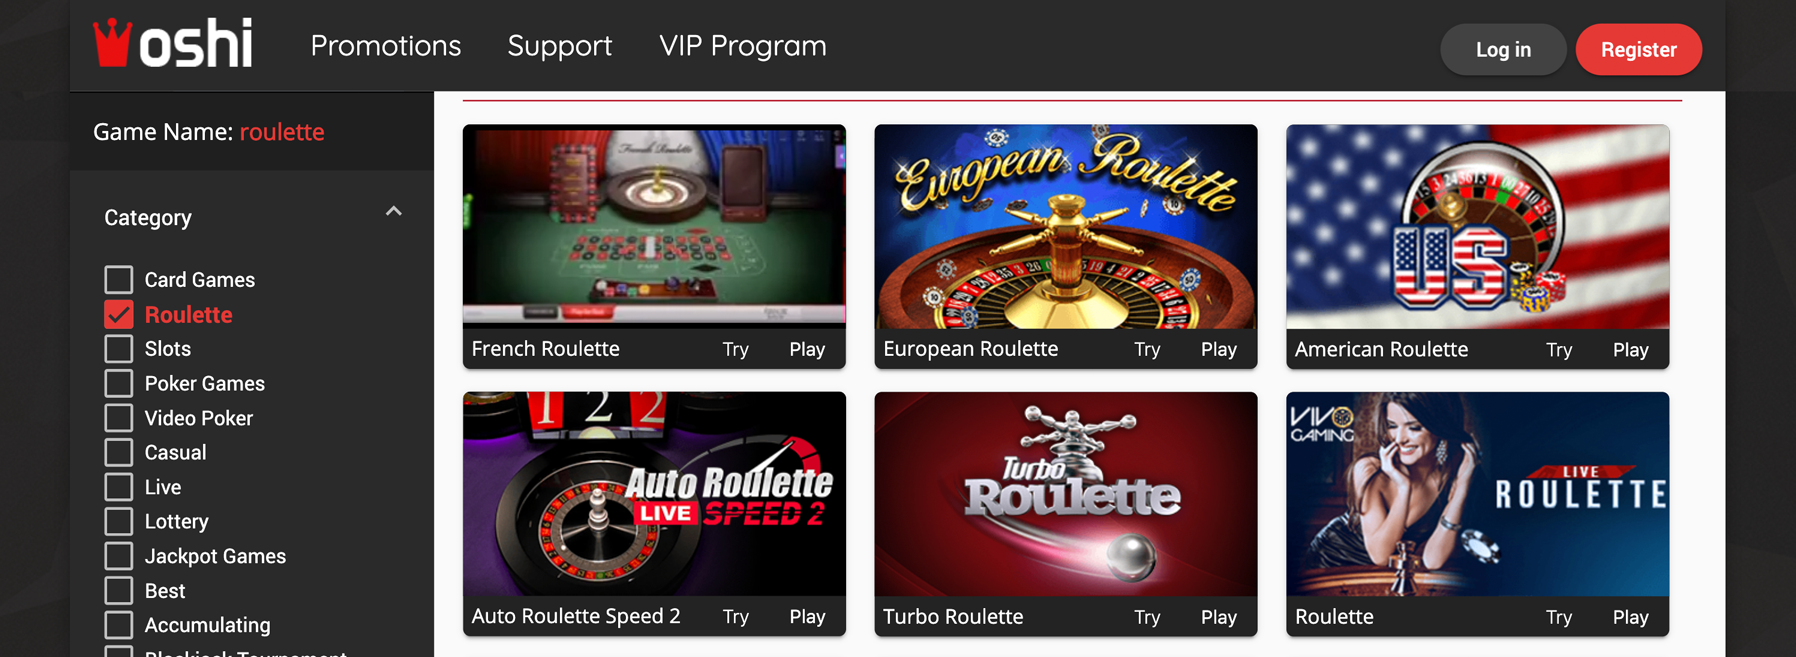 Oshi-kazino meniu ruletė internete